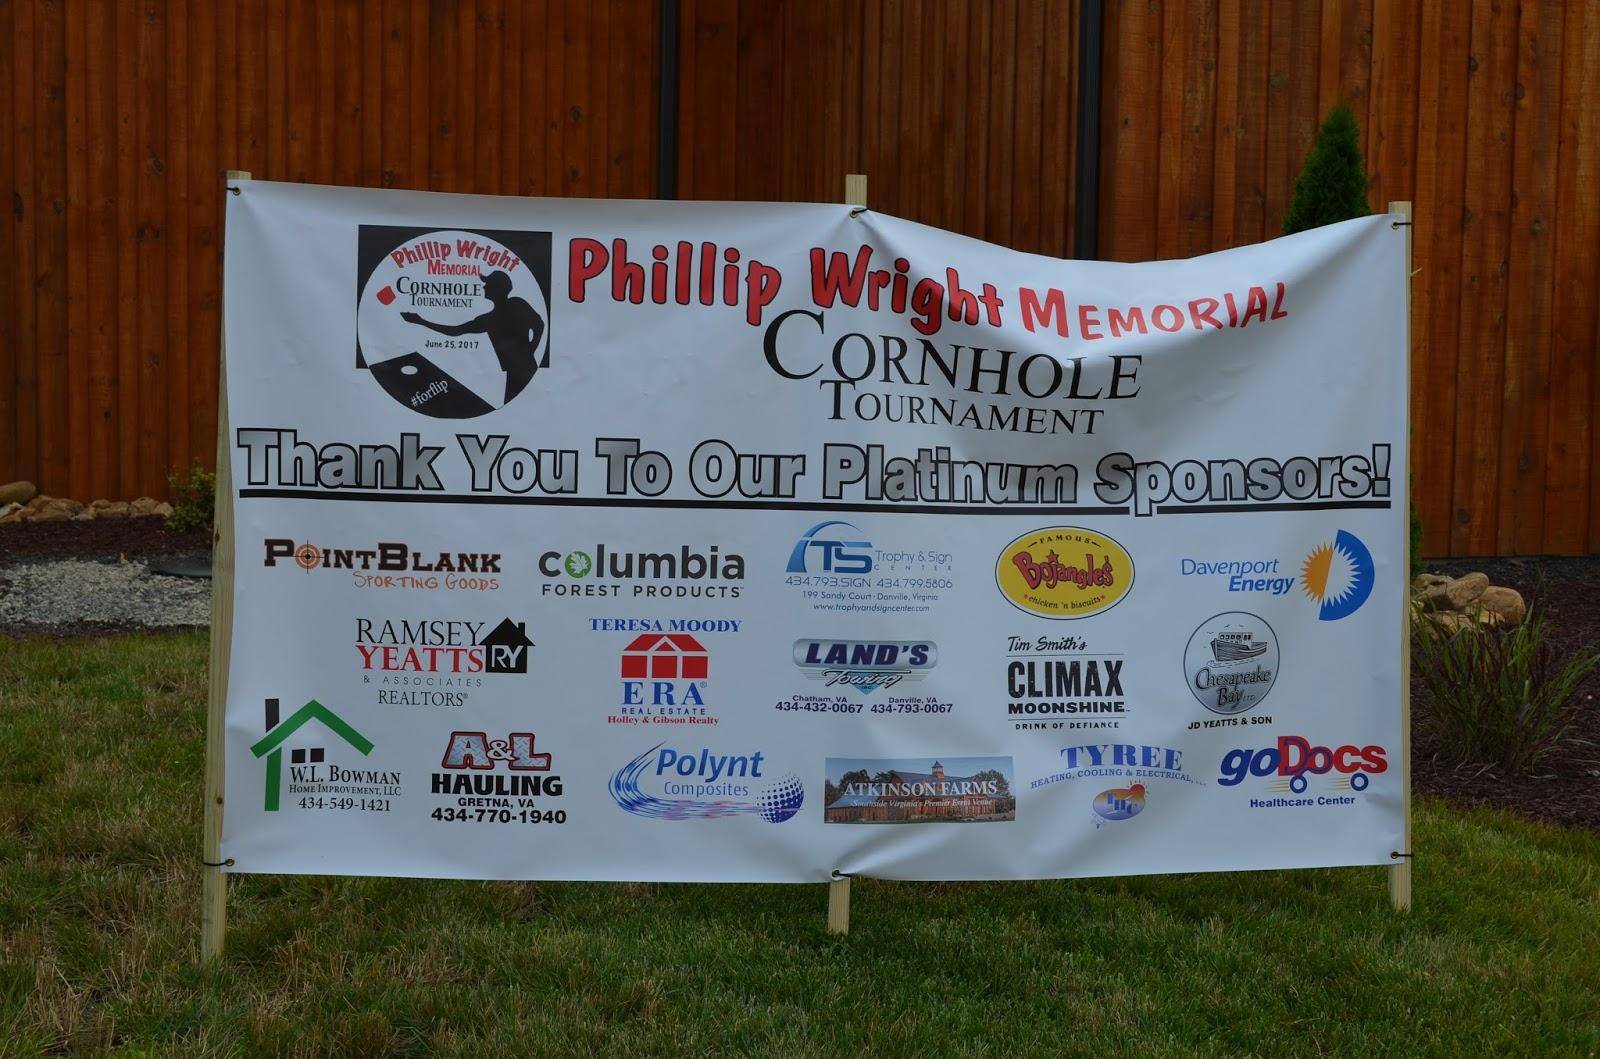 Phillip Wright Memorial Cornhole Tournament